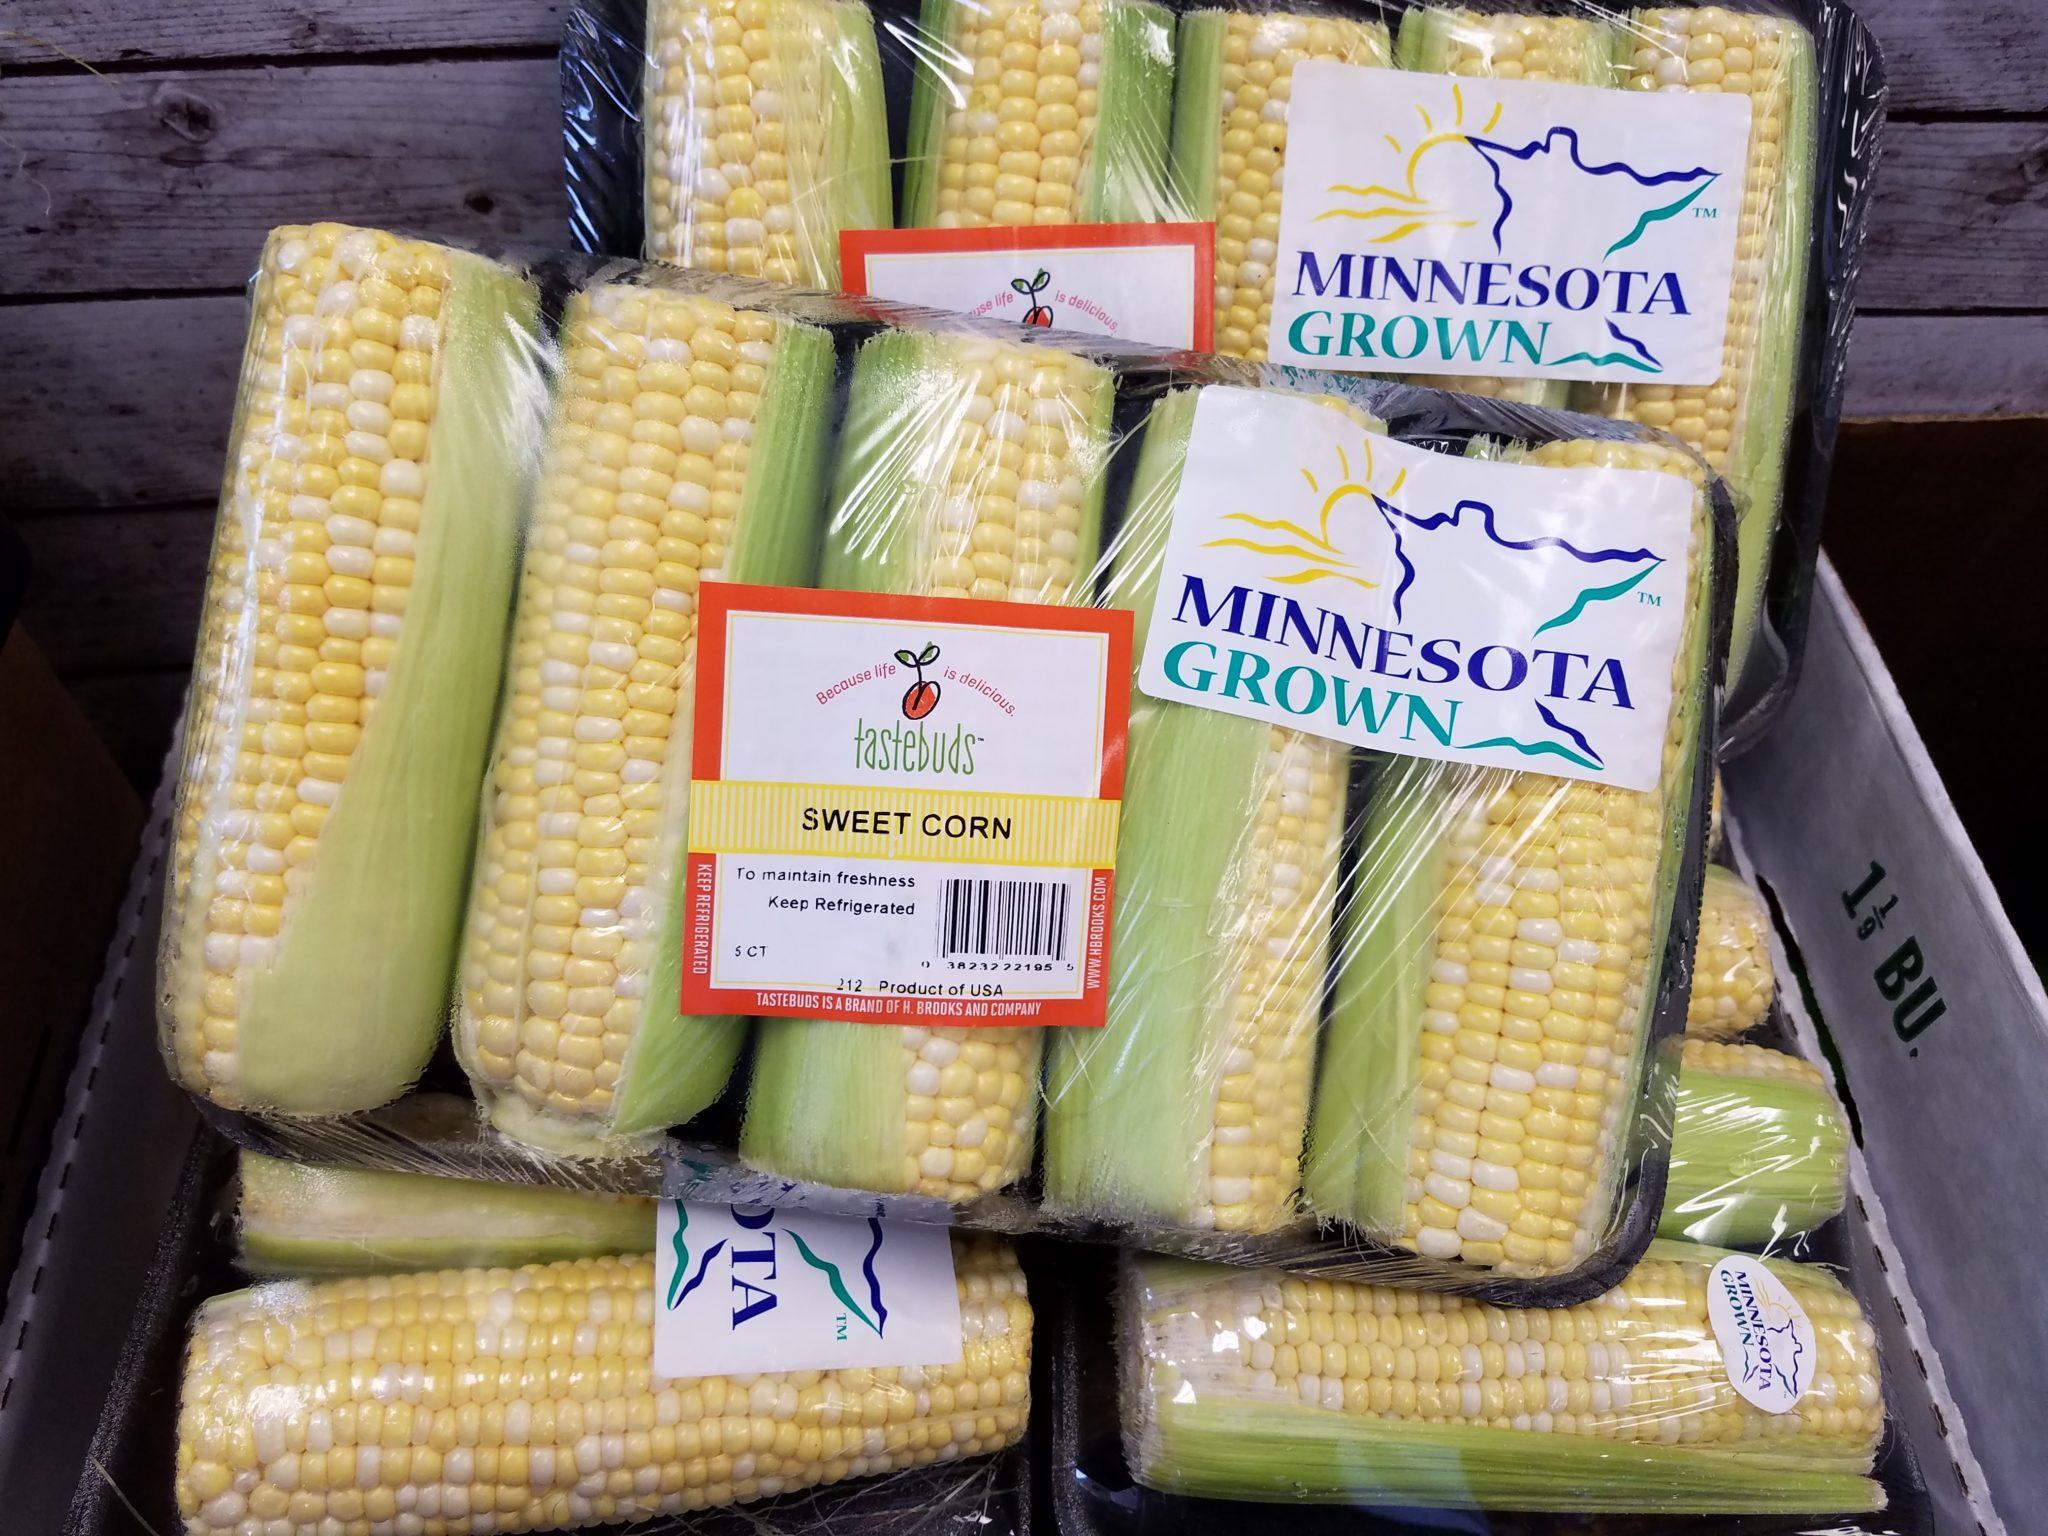 sweet corn packs with the minnestoa grown logo